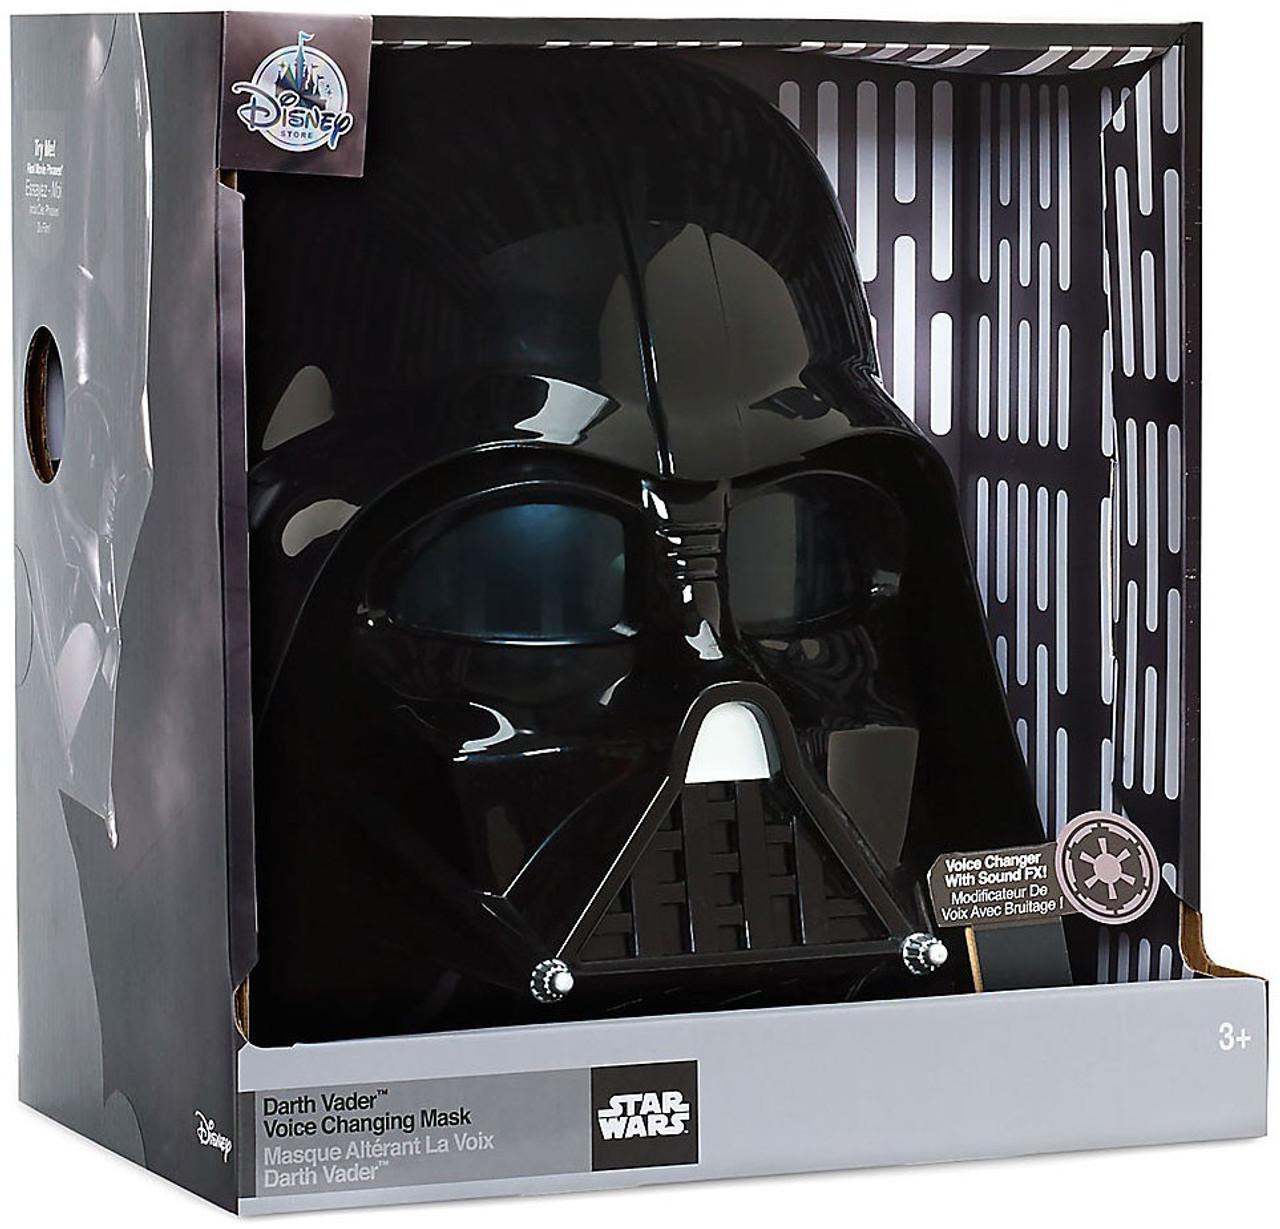 Disney Star Wars Darth Vader Exclusive Voice Changer Helmet